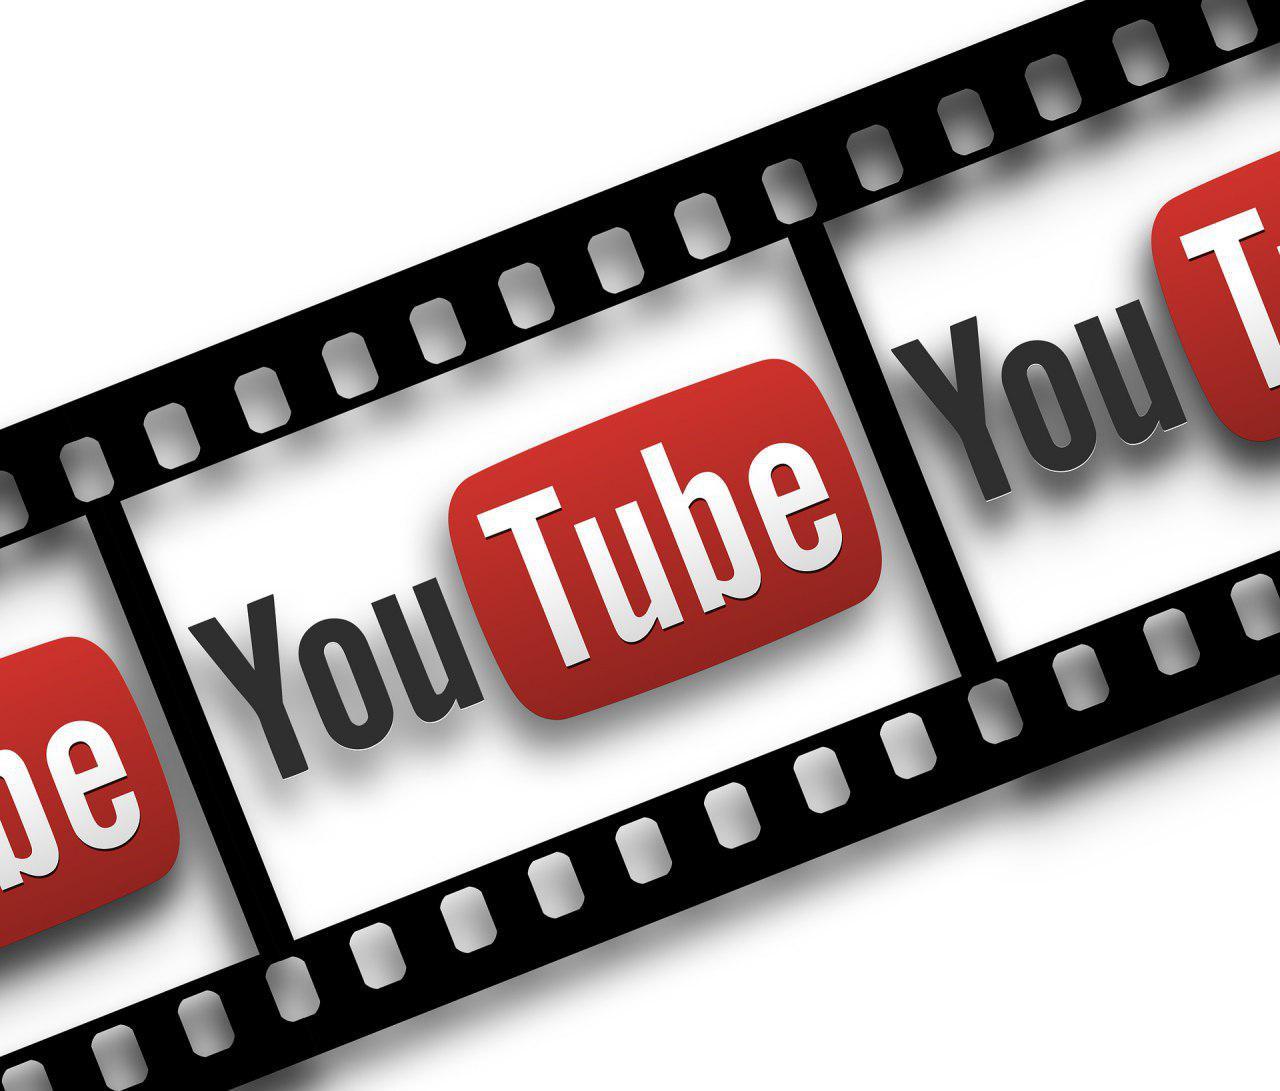 Продвижение канала в YouTube